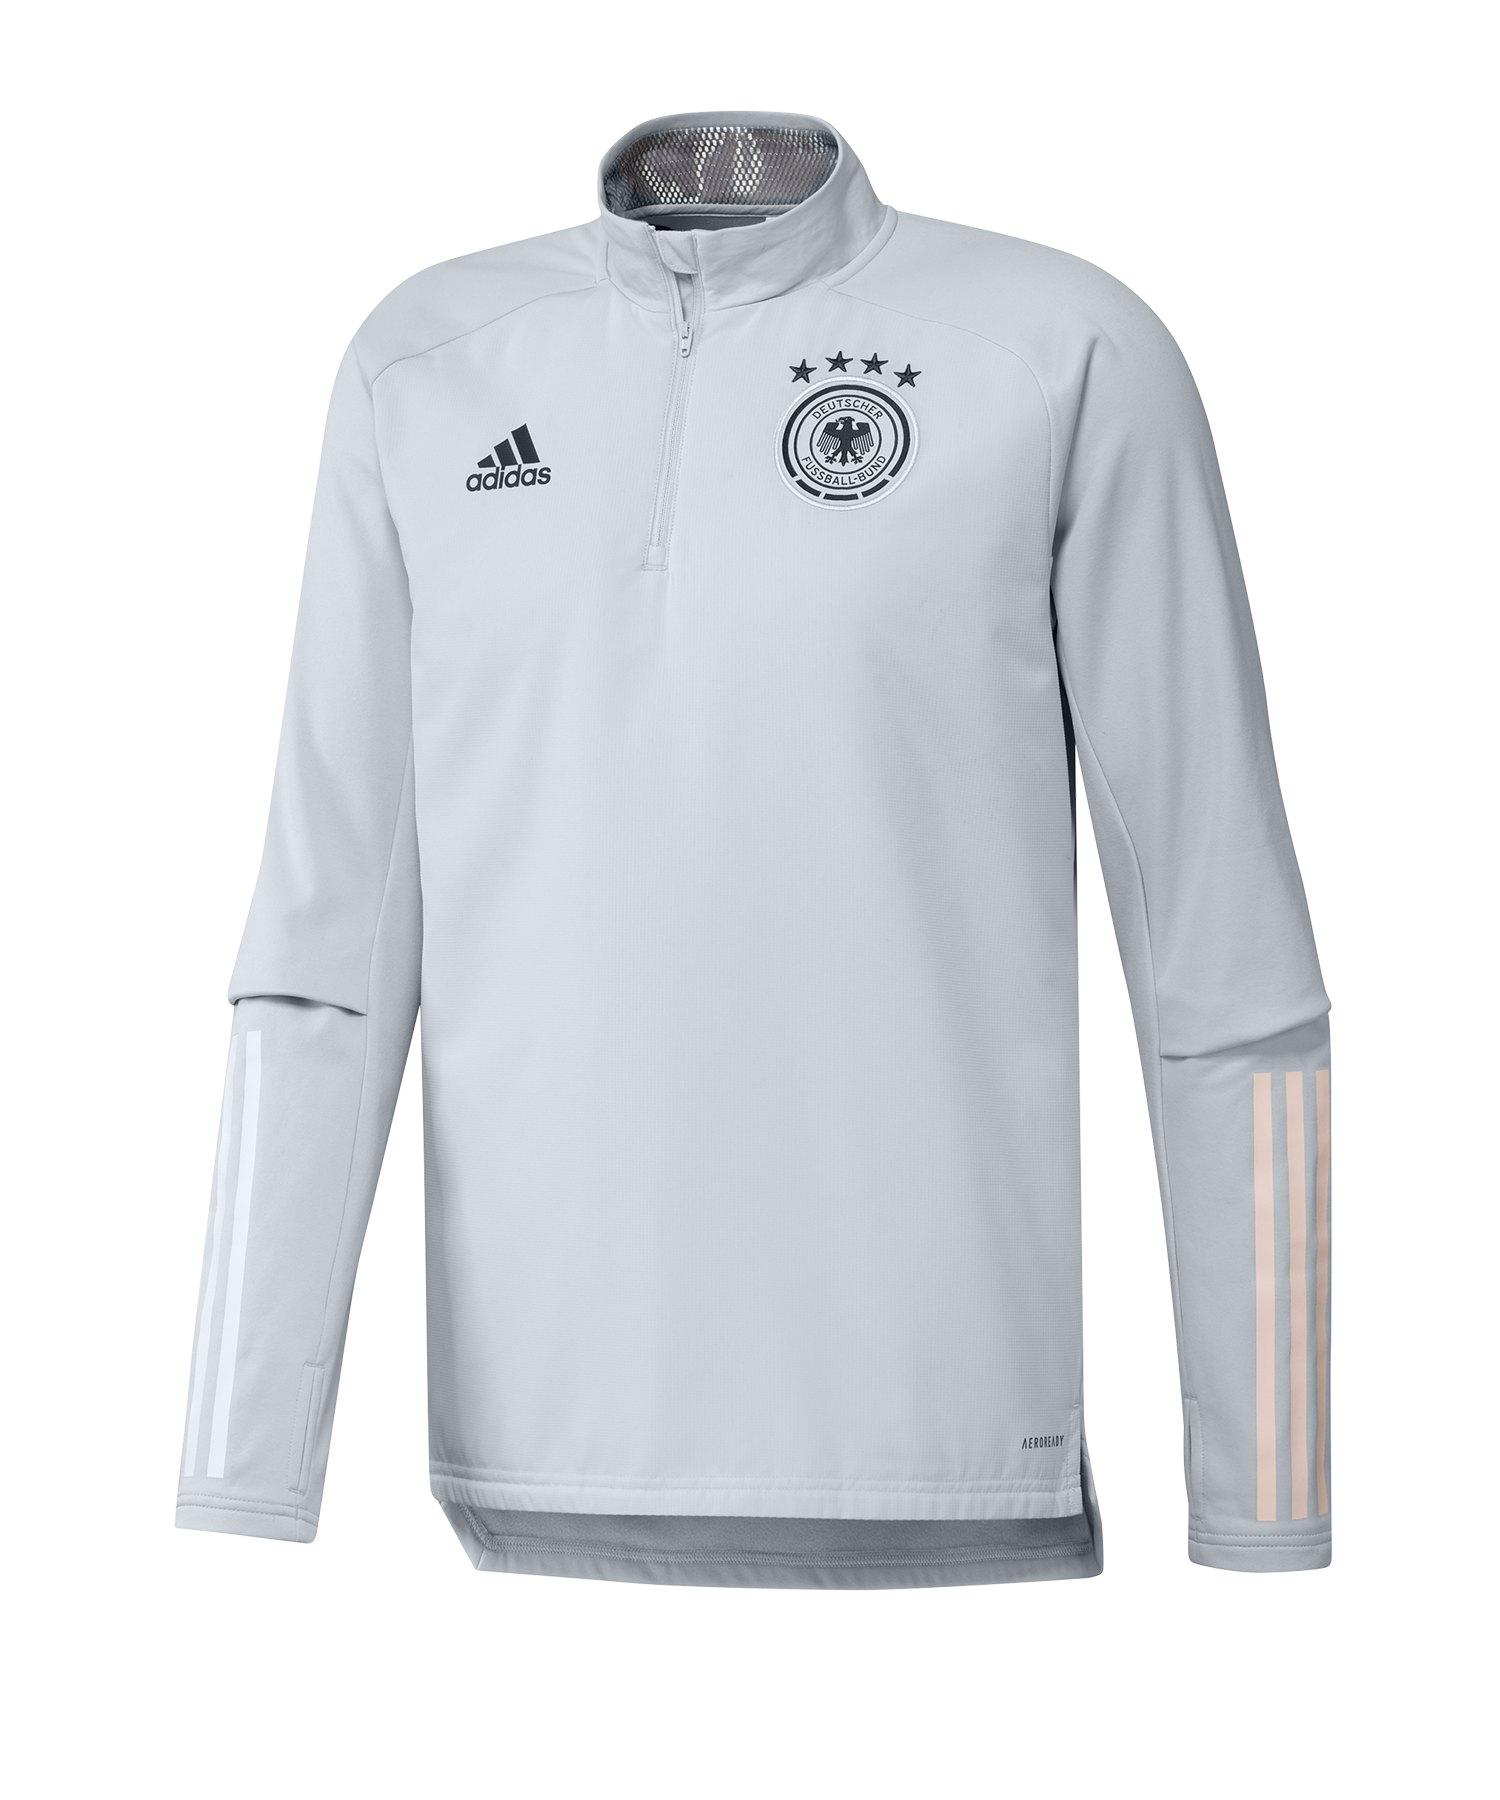 adidas DFB Deutschland 1/2 Zip Top LS Hellgrau - grau